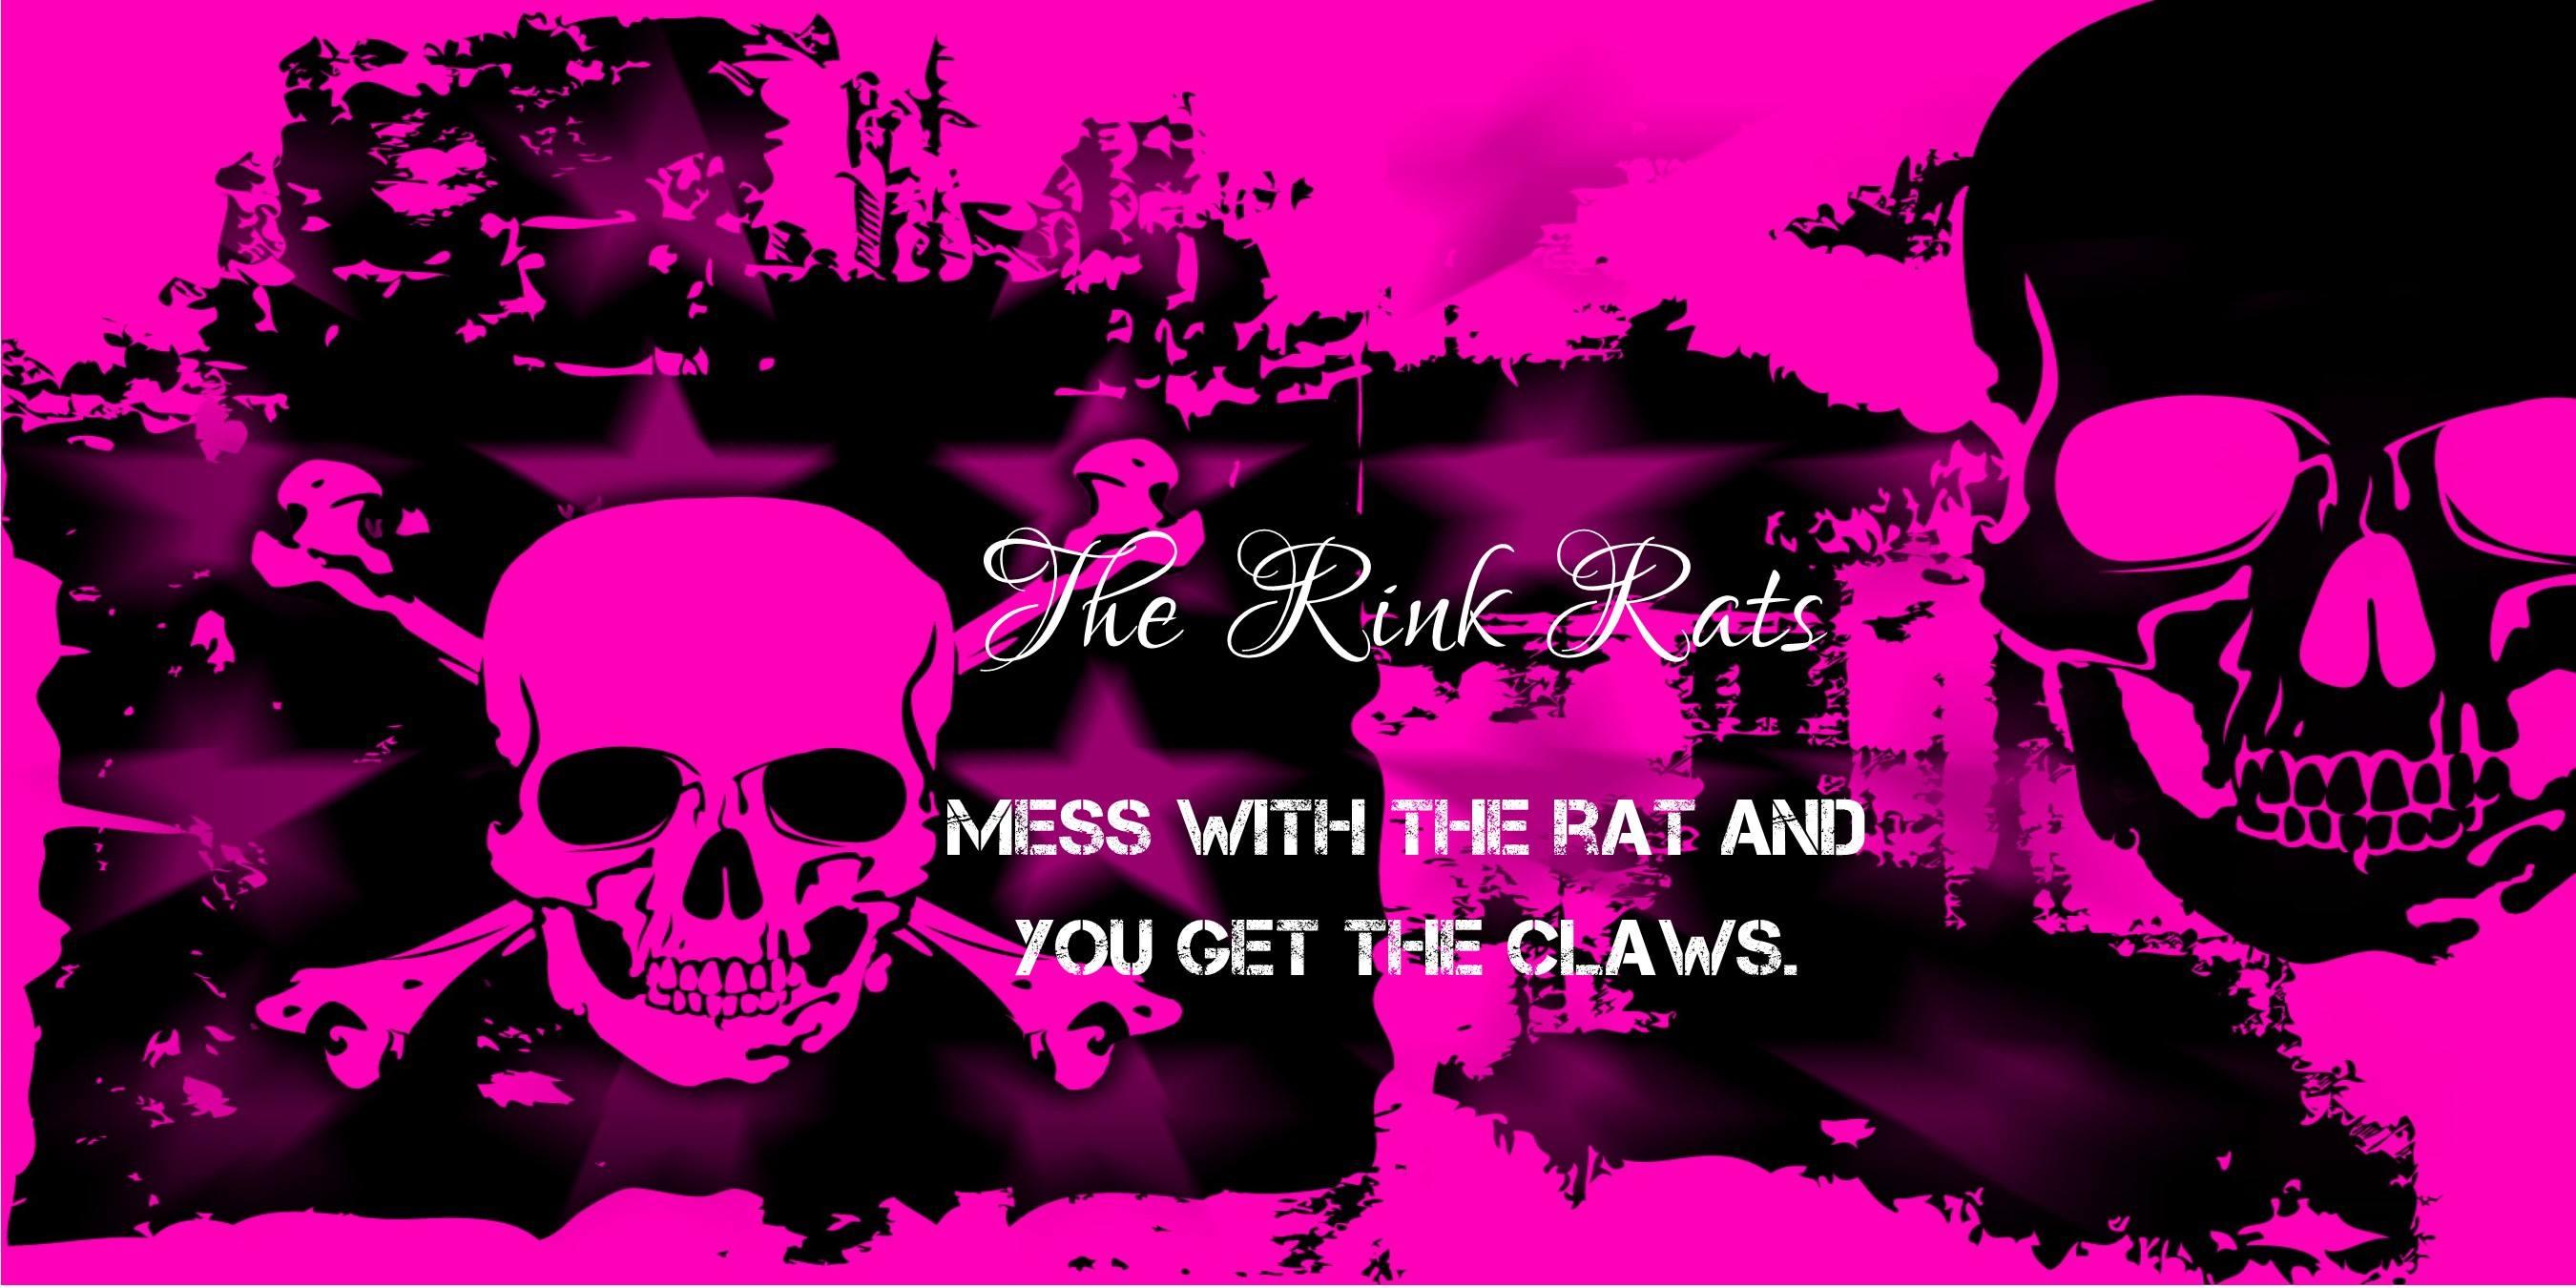 rink_rats